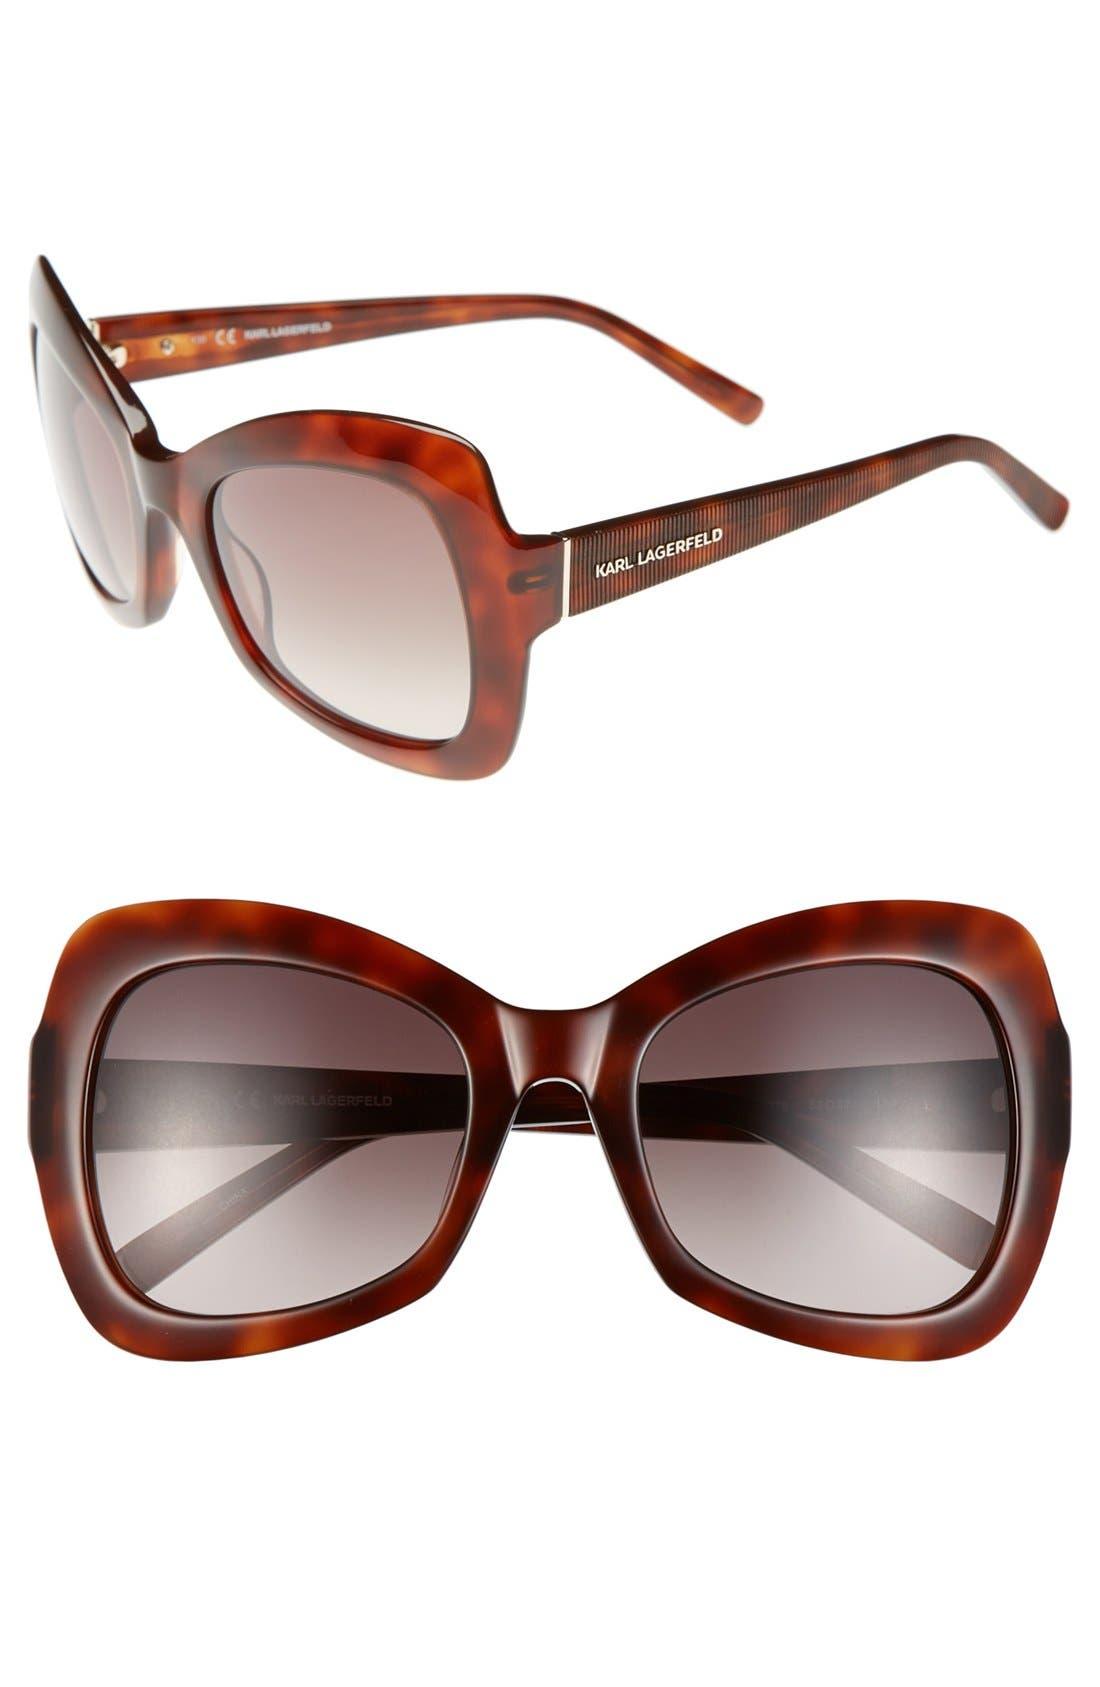 Alternate Image 1 Selected - Karl Lagerfeld 53mm Oversized Butterfly Sunglasses